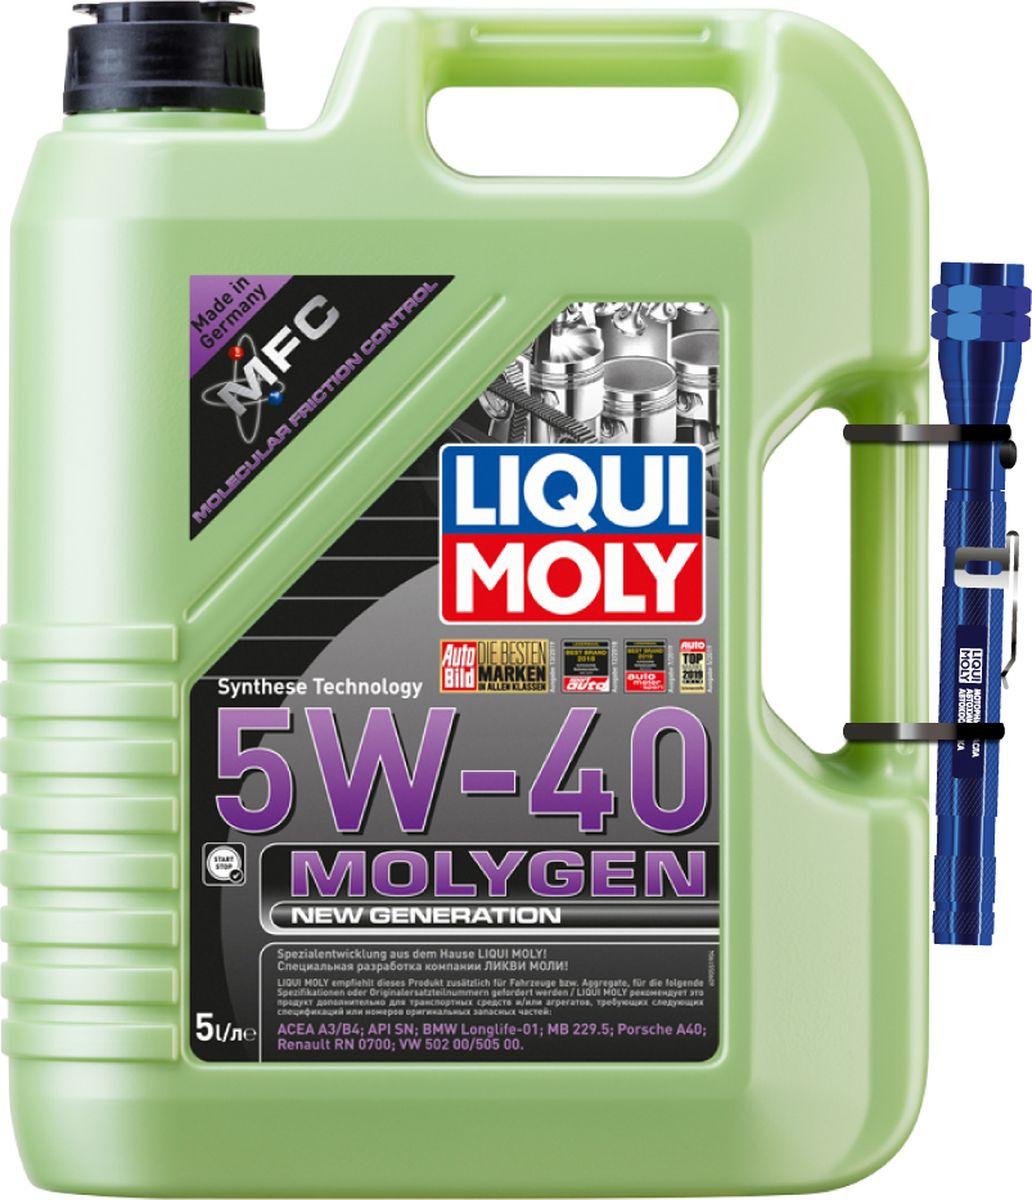 Моторное масло Liqui Moly Molygen New Generation, НС-синтетическое, 5W-40, 5 л + Фонарик в подарок 9042d liquimoly нс синт мот масло molygen new generation 5w 30 4л фонарик арт 7520r